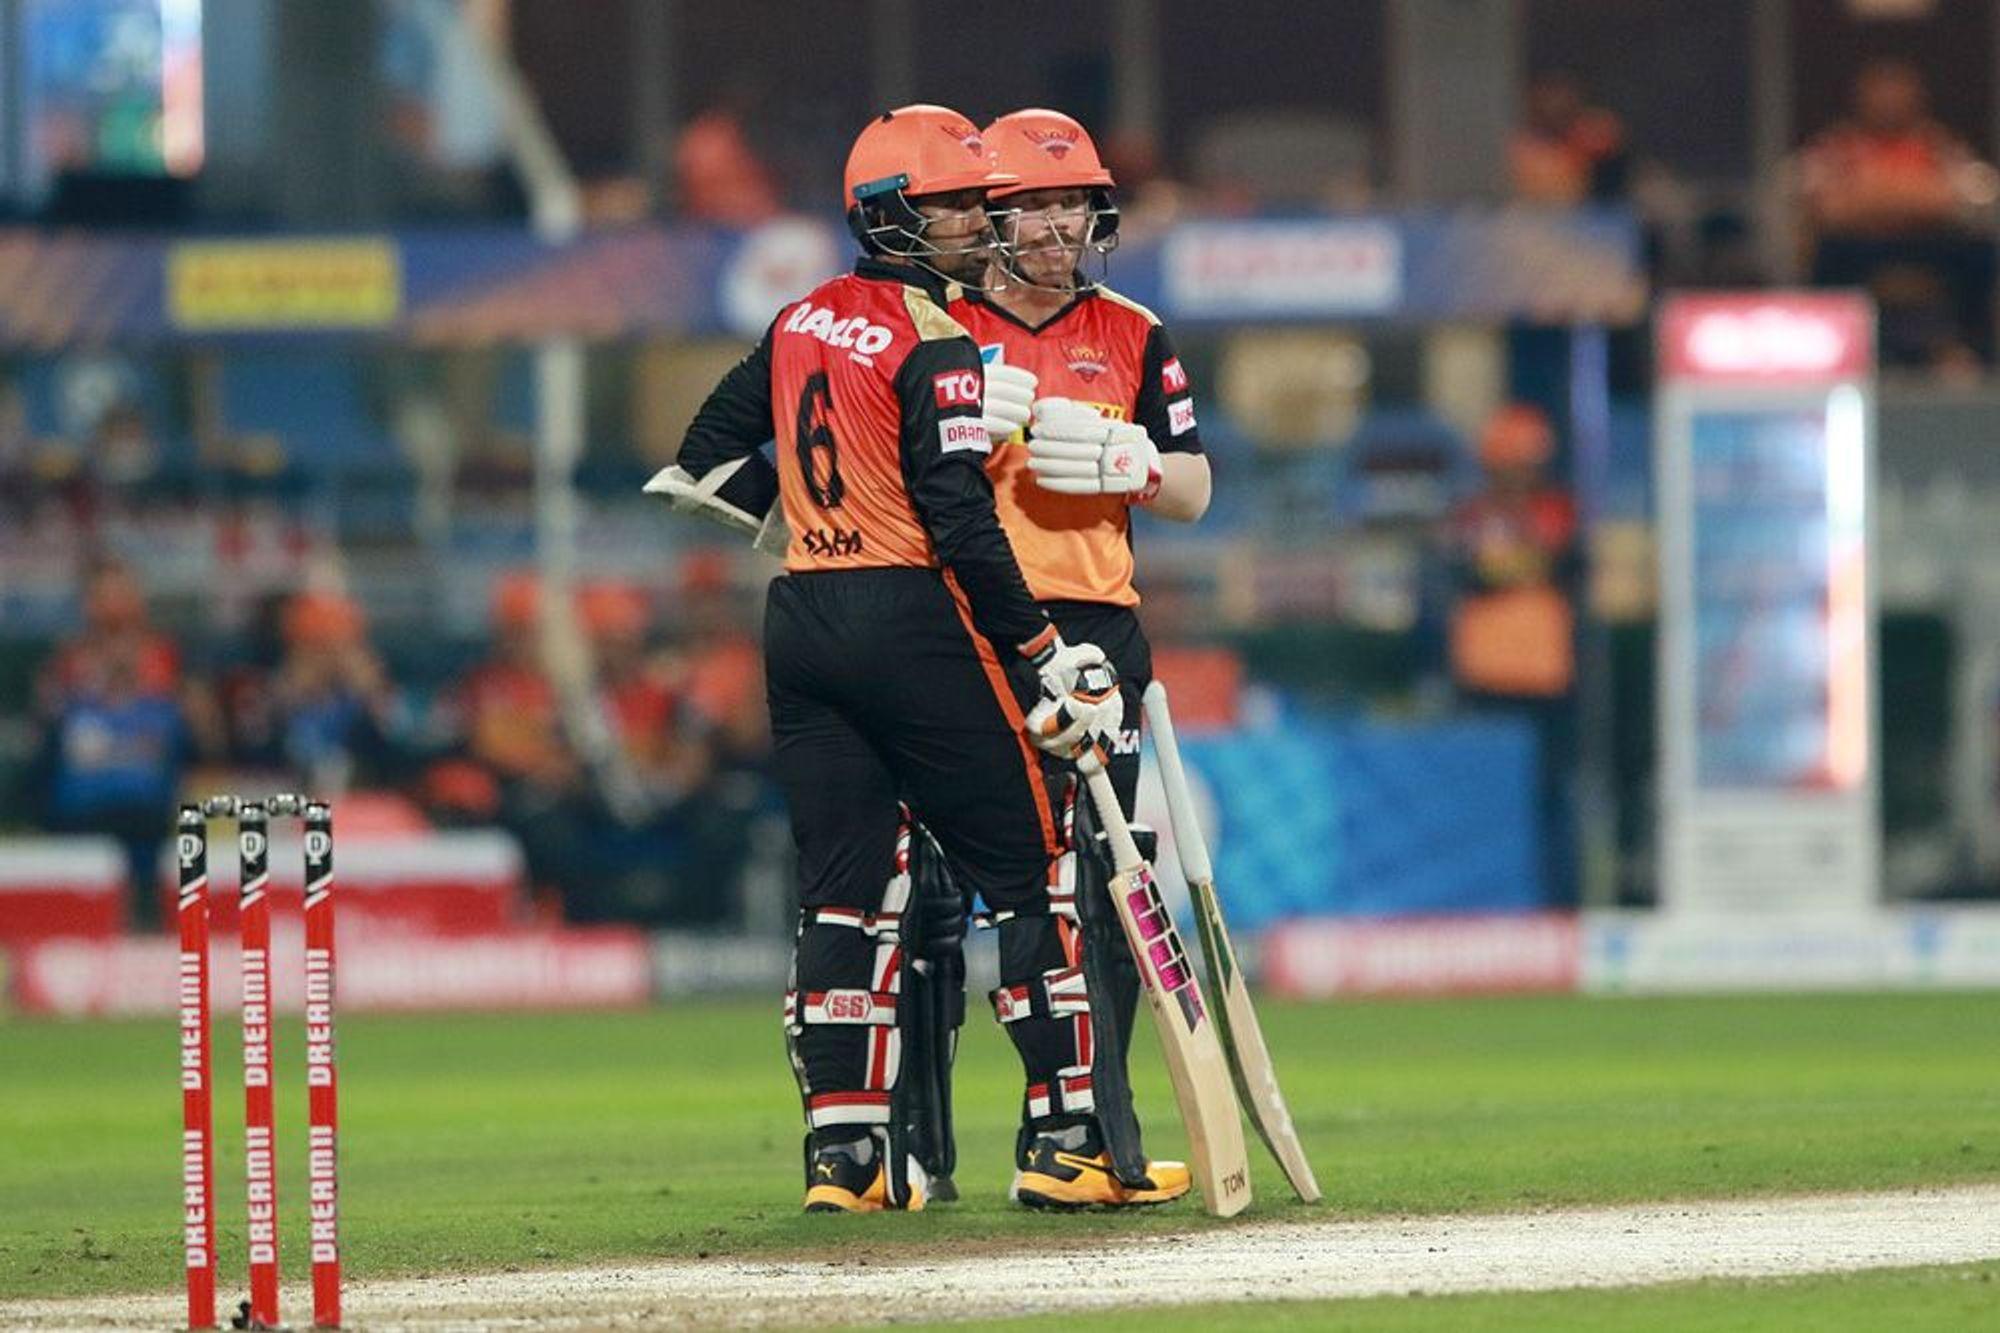 David Warner and Wriddhiman Saha scored fifties against MI in Sharjah. (Photo - BCCI / IPL)